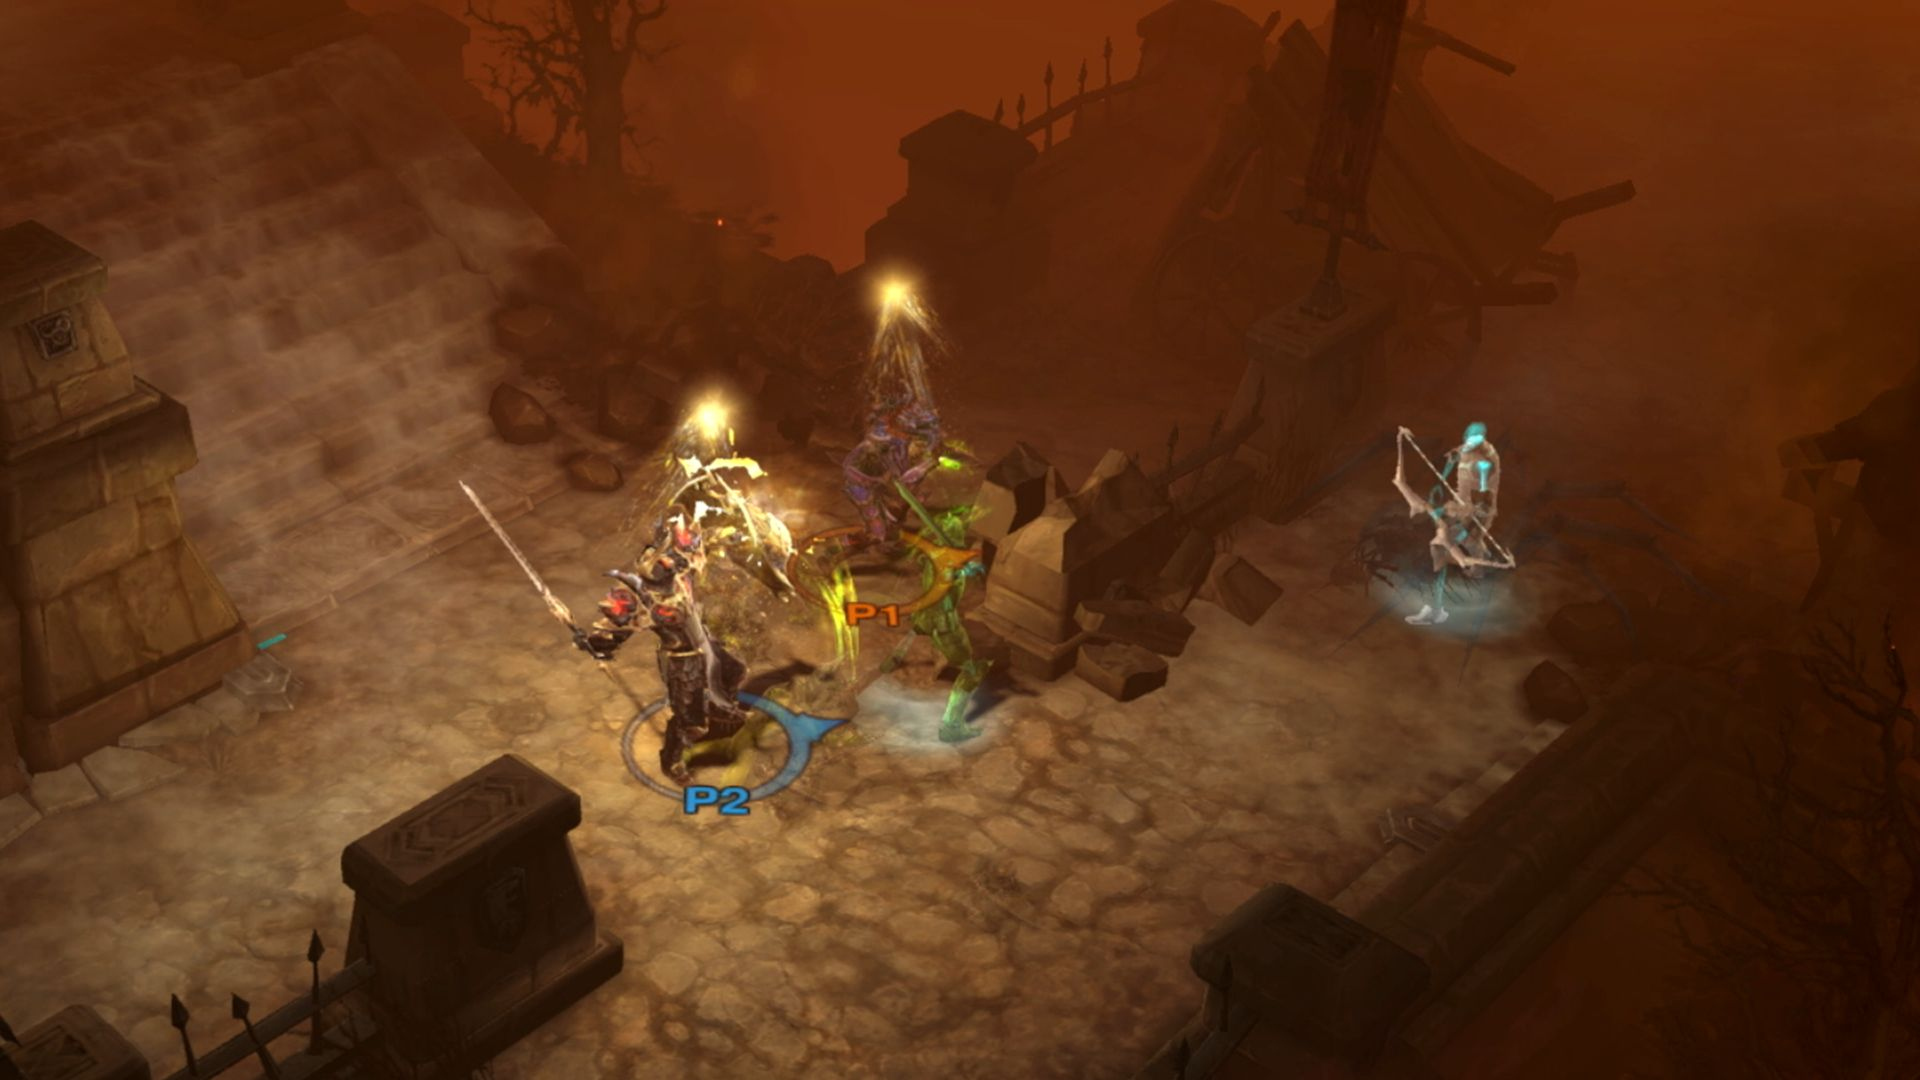 Diablo 3 review image 4